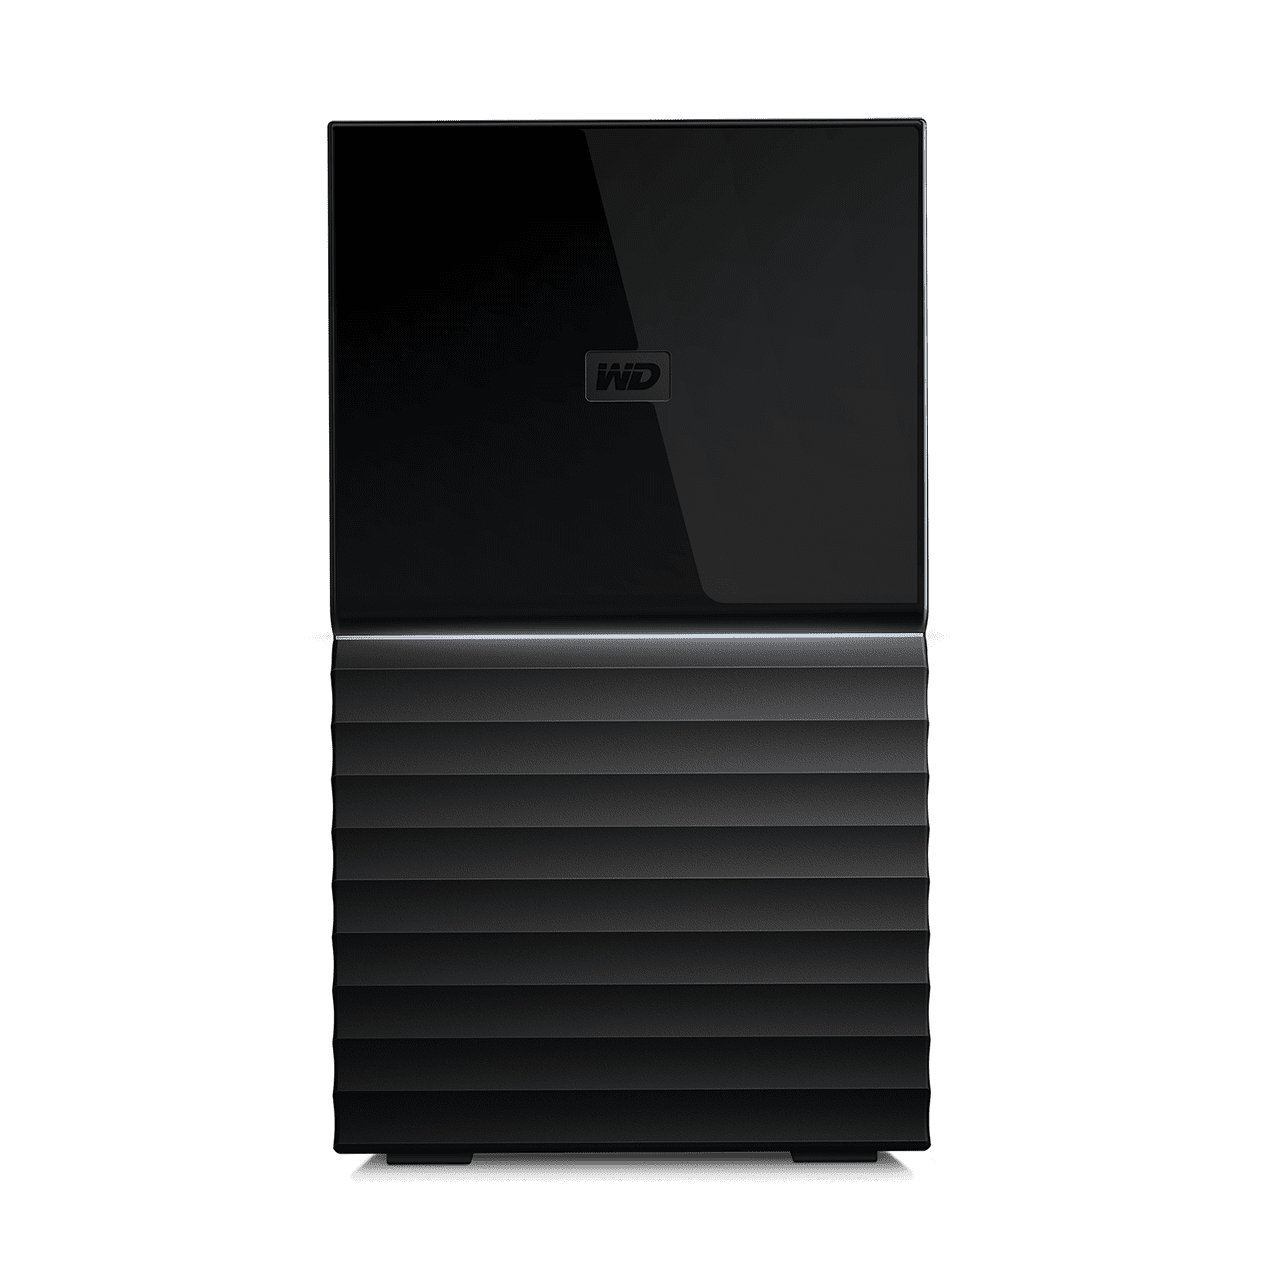 【UH 3C】威騰 WD My Book Duo 16TB (8TBx2) 3.5吋 雙硬碟 WDBFBE0160JBK